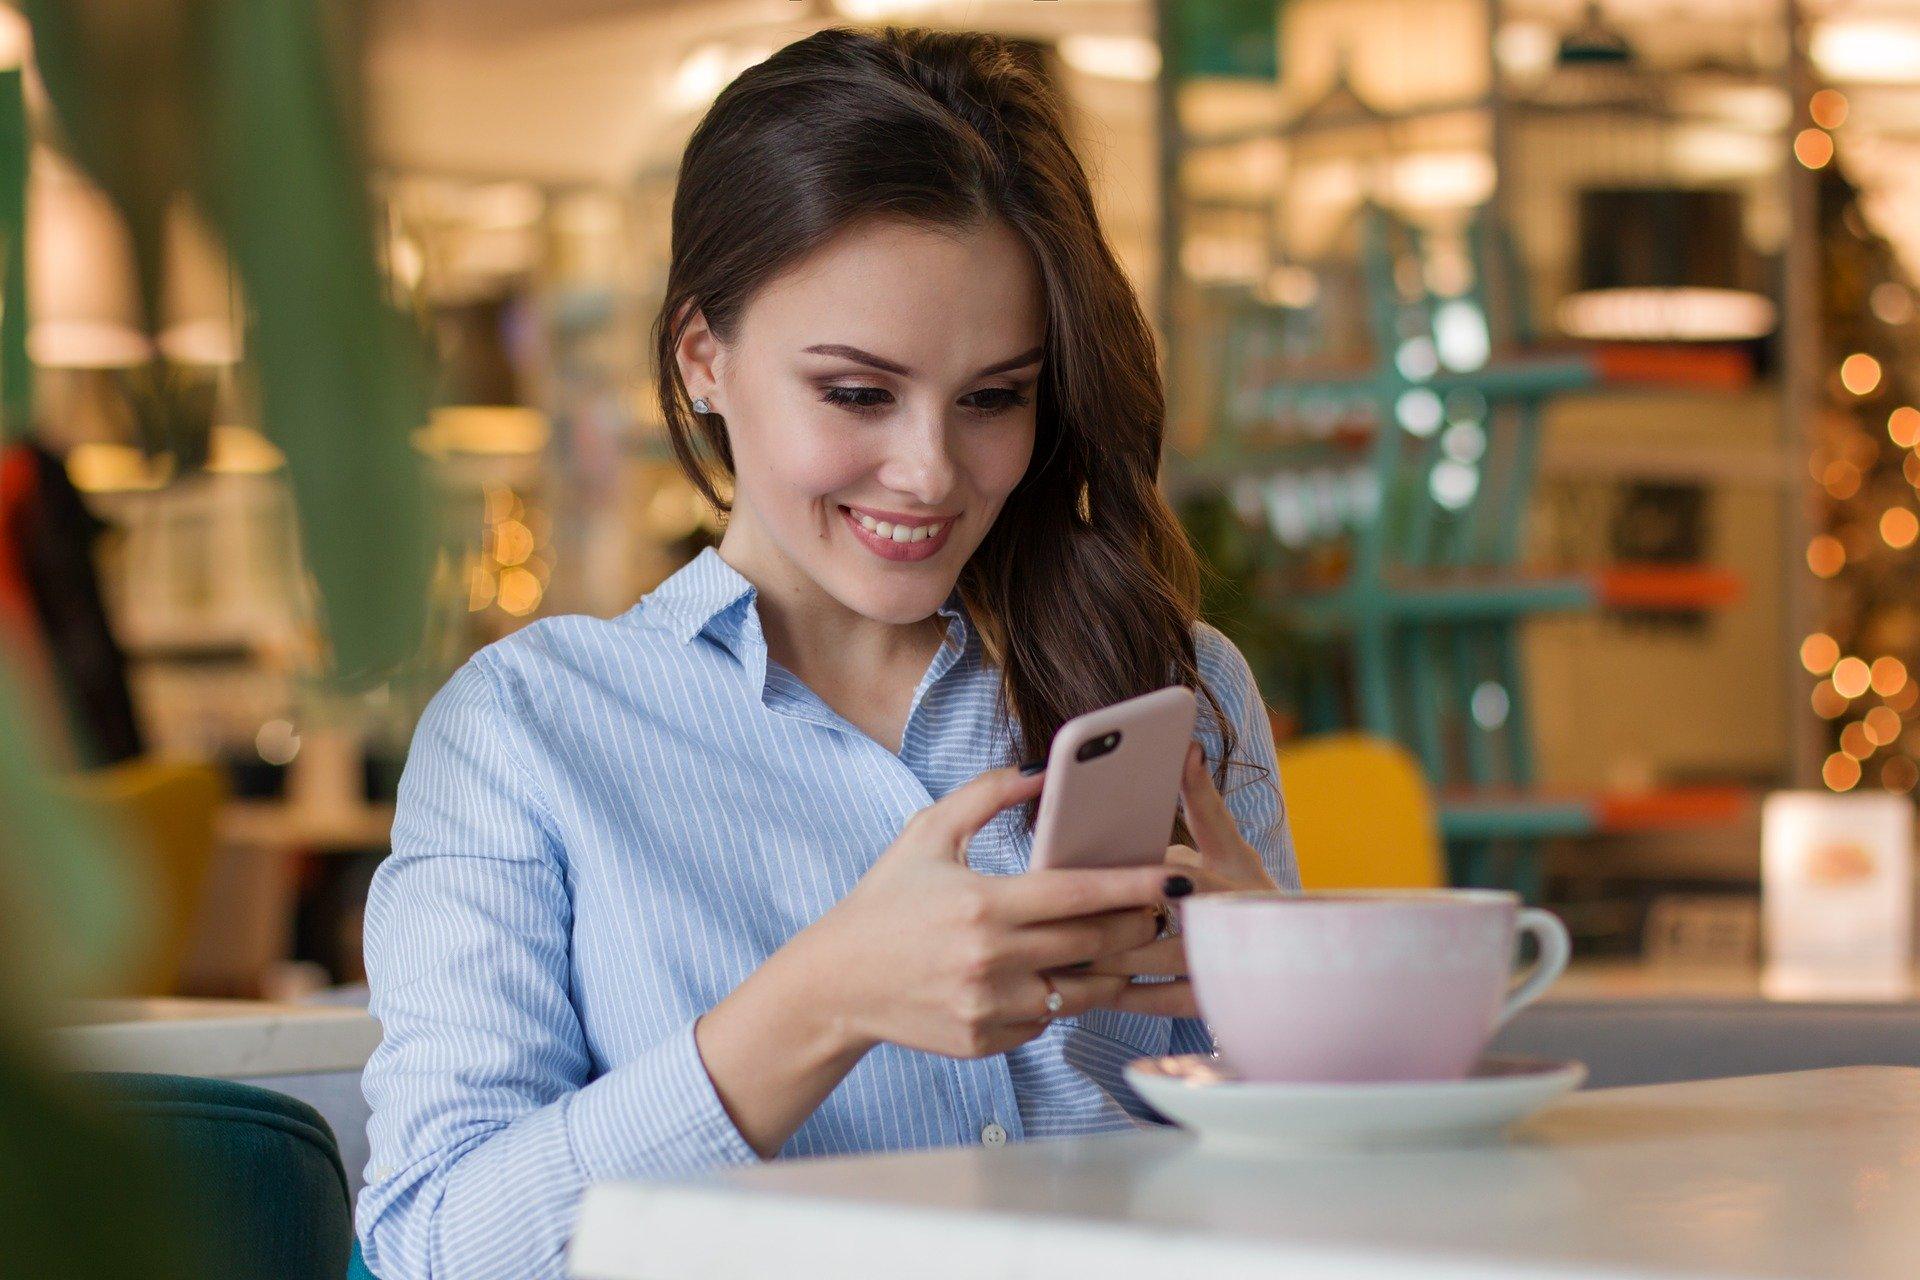 Sextingul pe Snapchat – o alta metoda eficienta de a face bani din videochat!